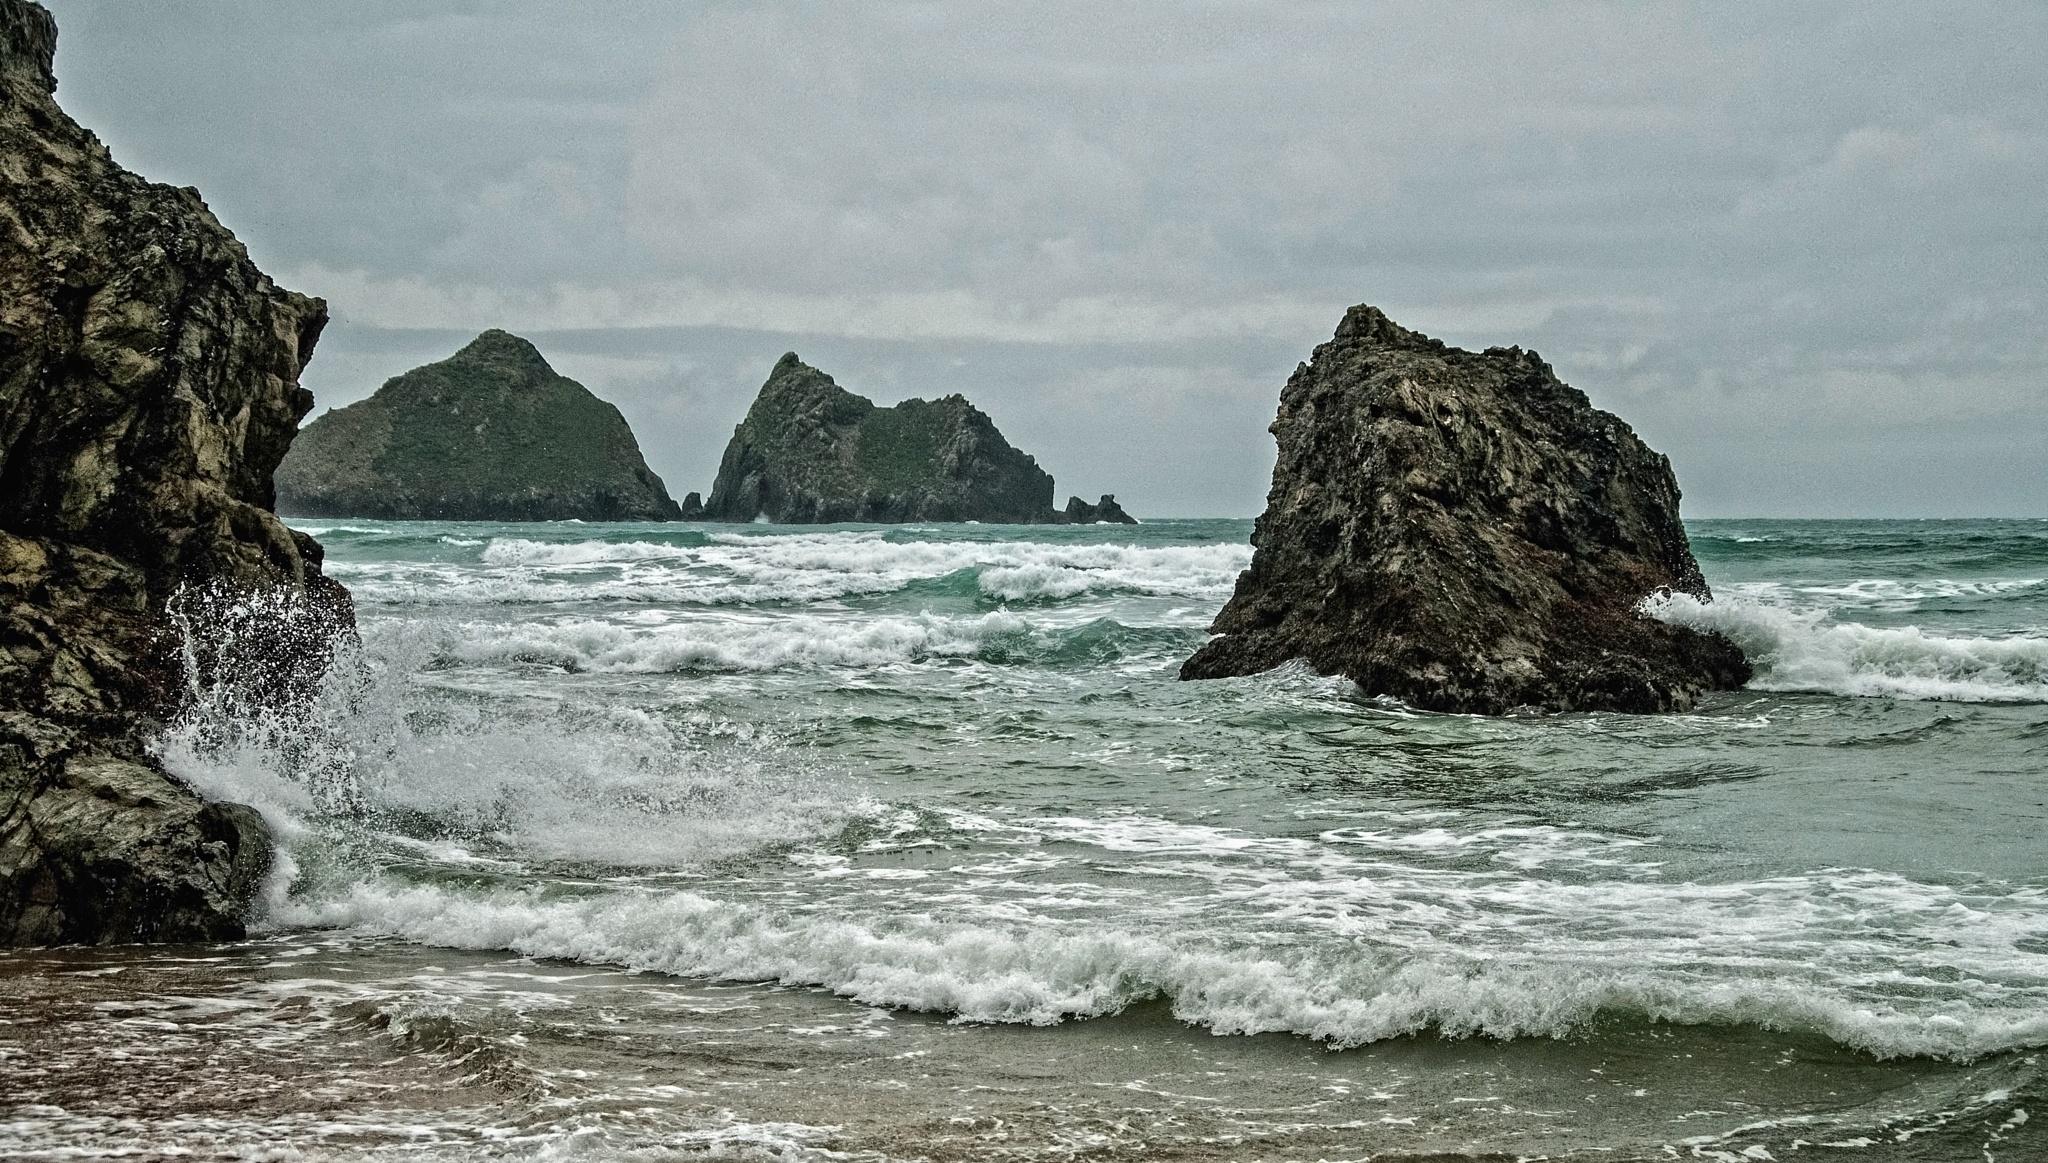 Smashing at the rocks by MADOLDIE